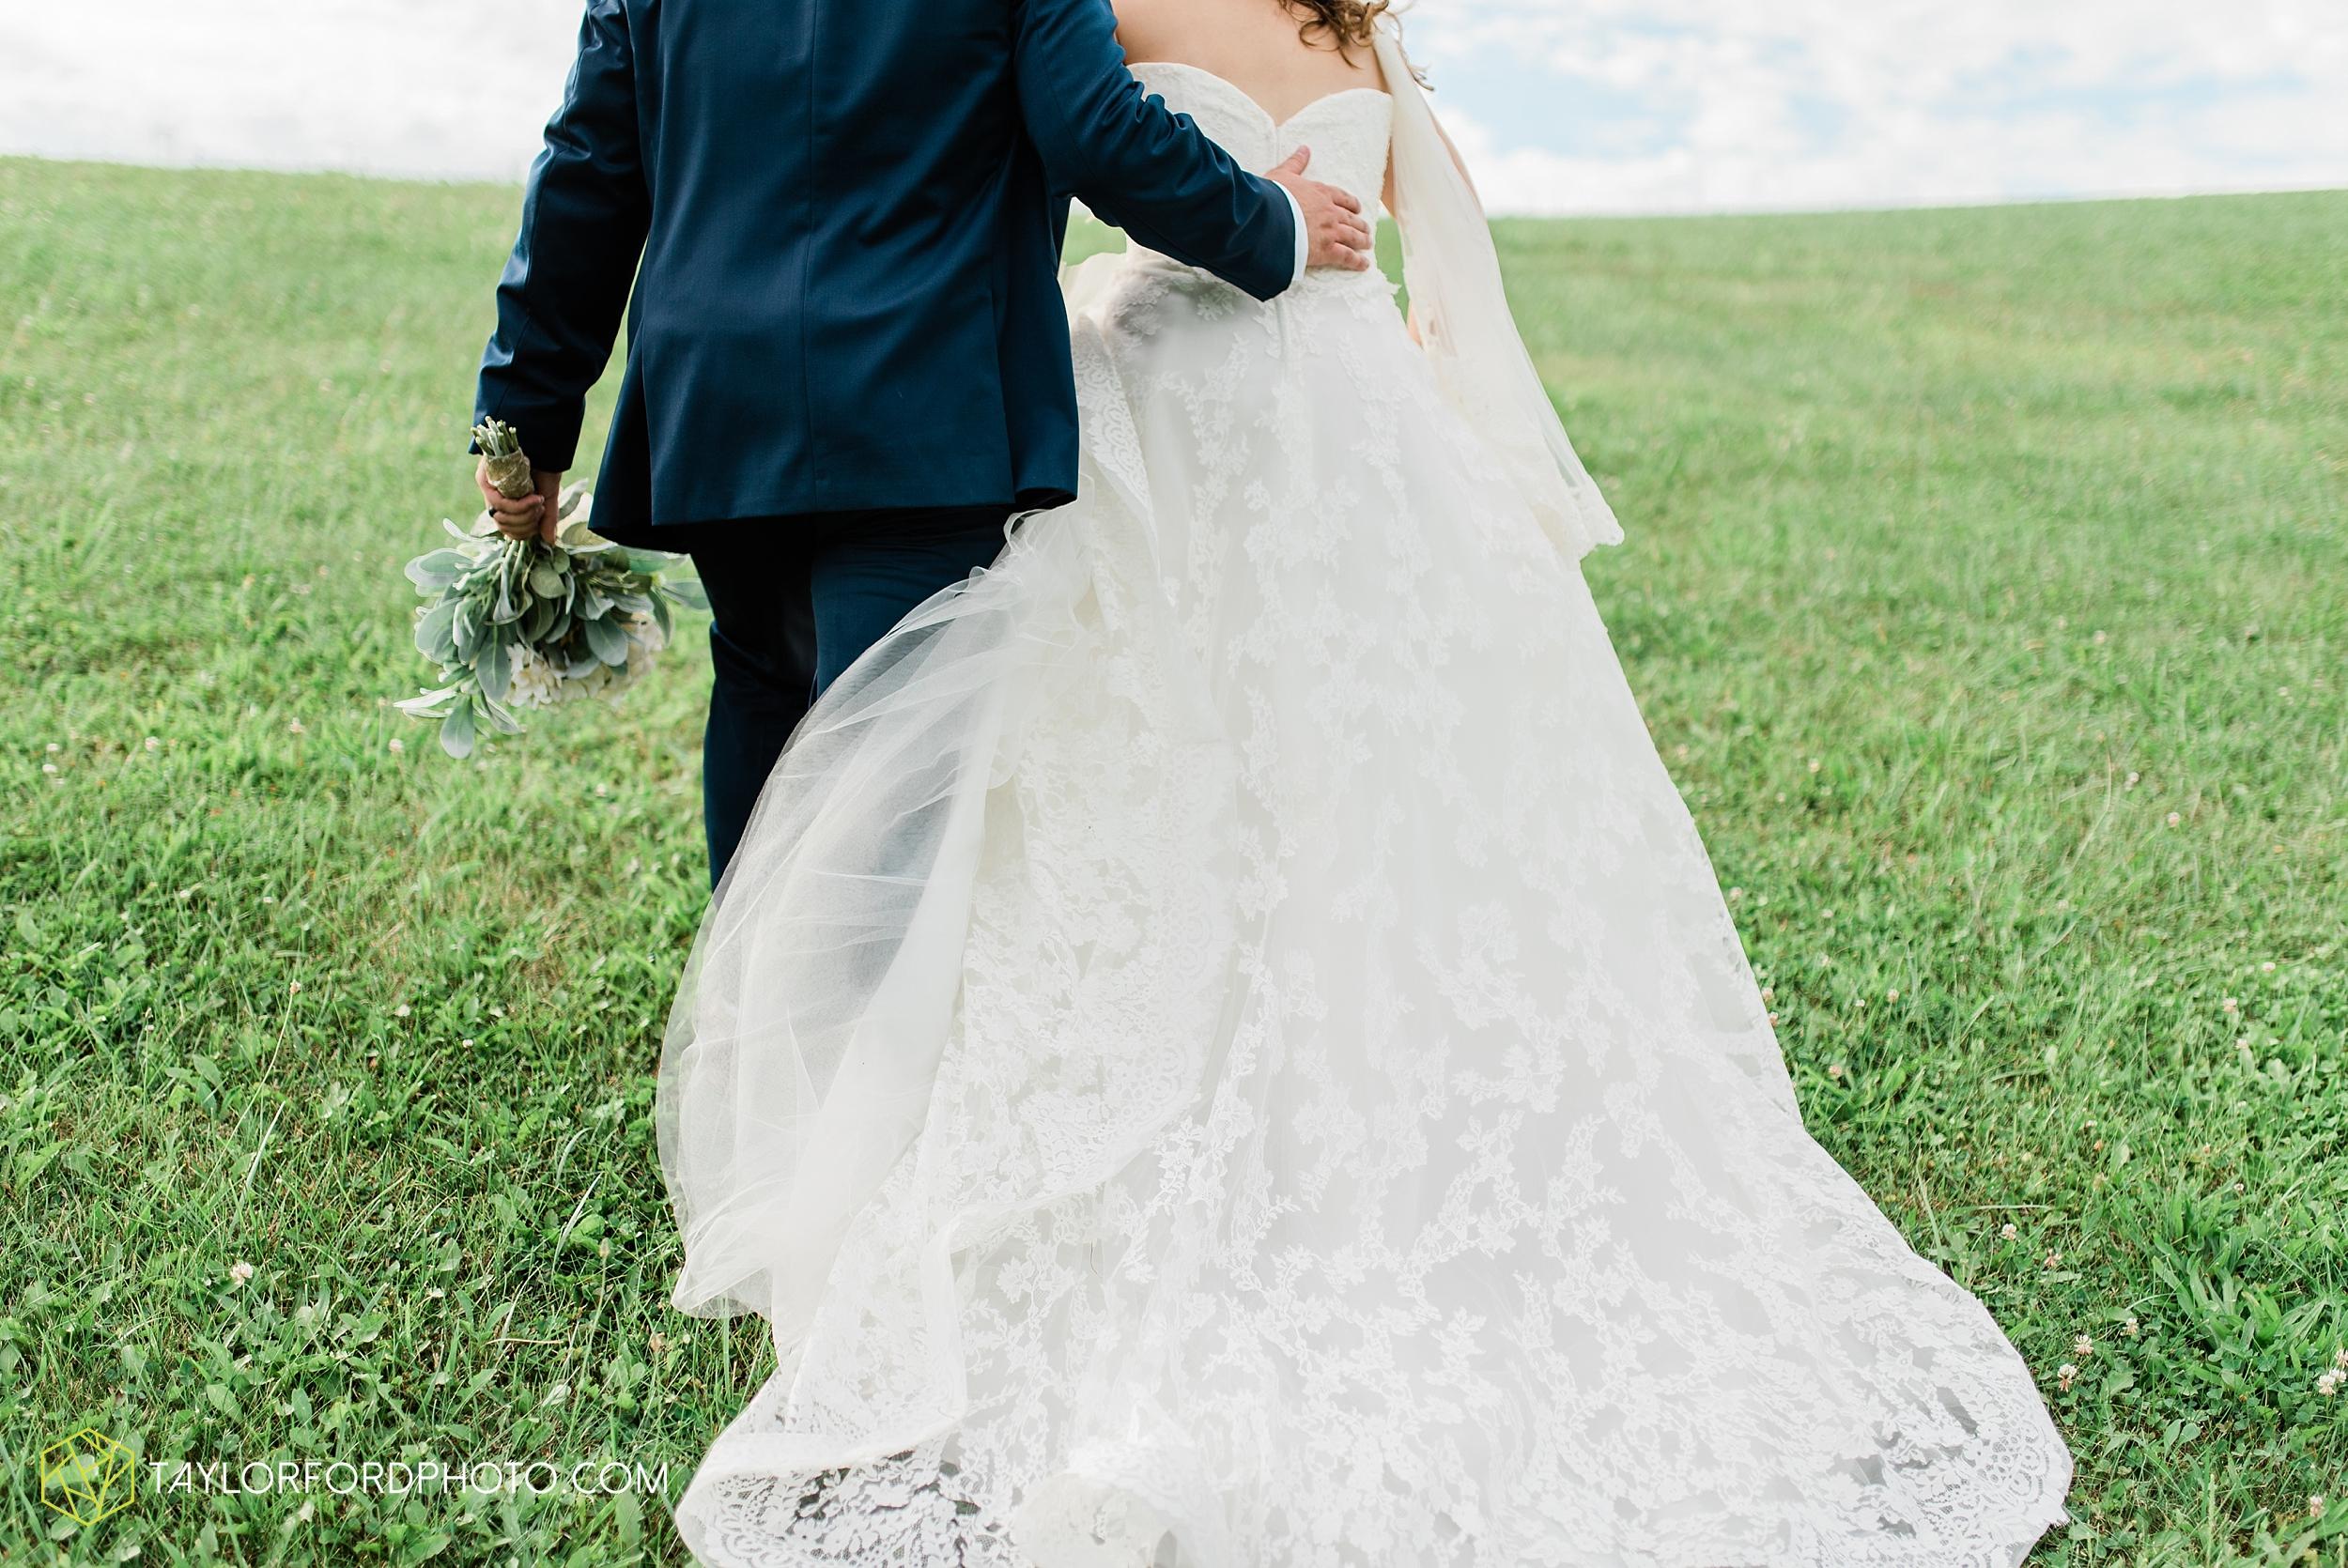 chelsey-zosh-jackson-young-first-united-methodist-church-senior-center-van-wert-ohio-wedding-photographer-taylor-ford-photography_0086.jpg